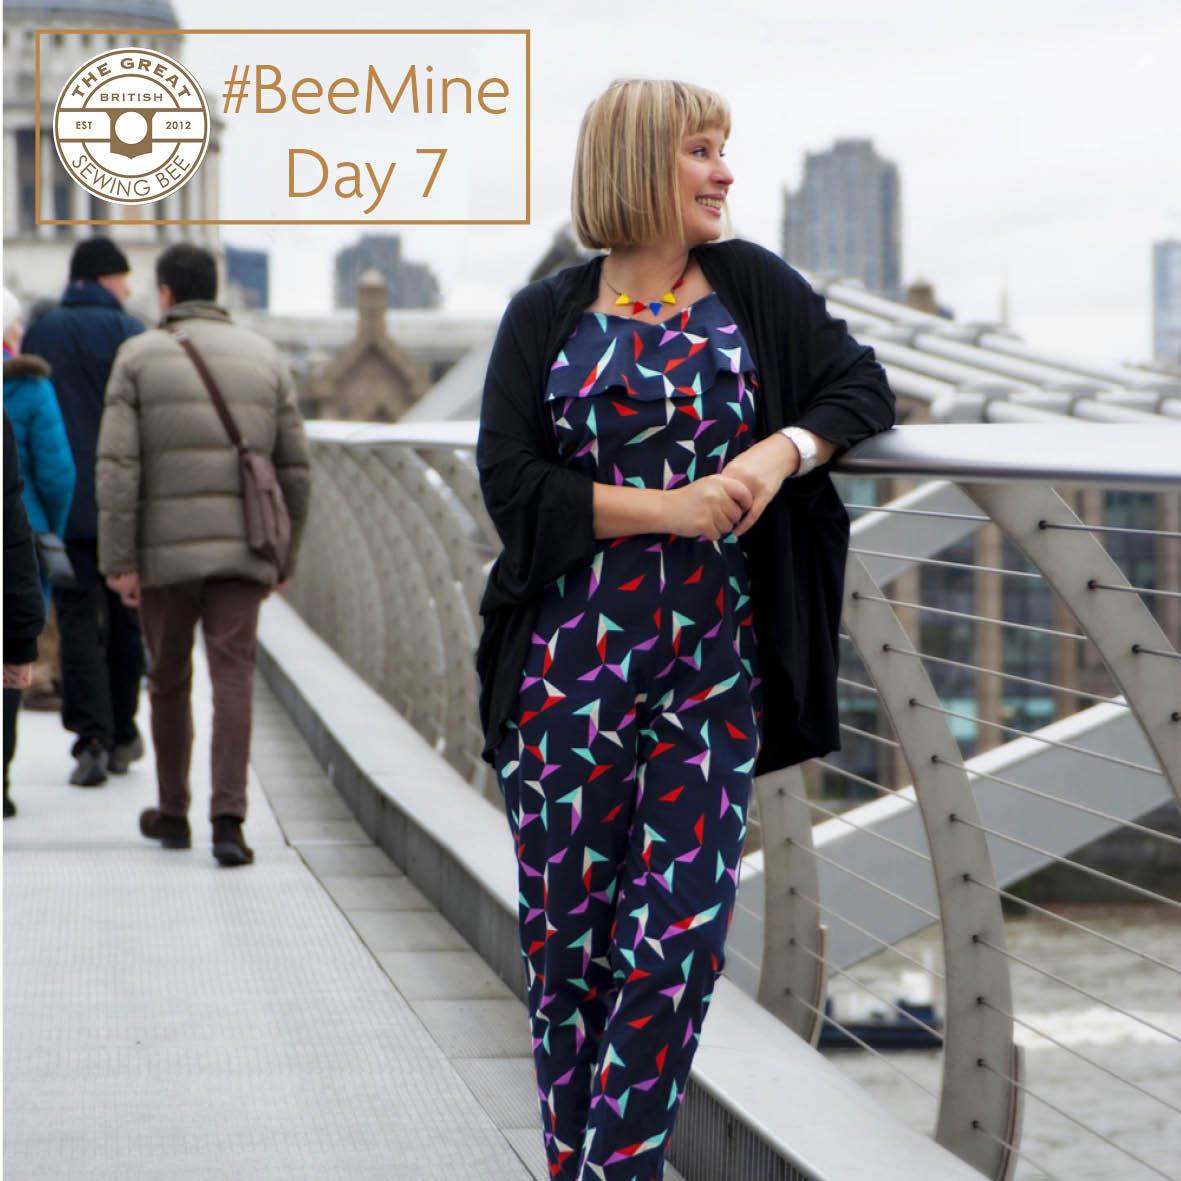 Day 7 #BeeMine- My 30 day blog challenge- Fashion With Fabric